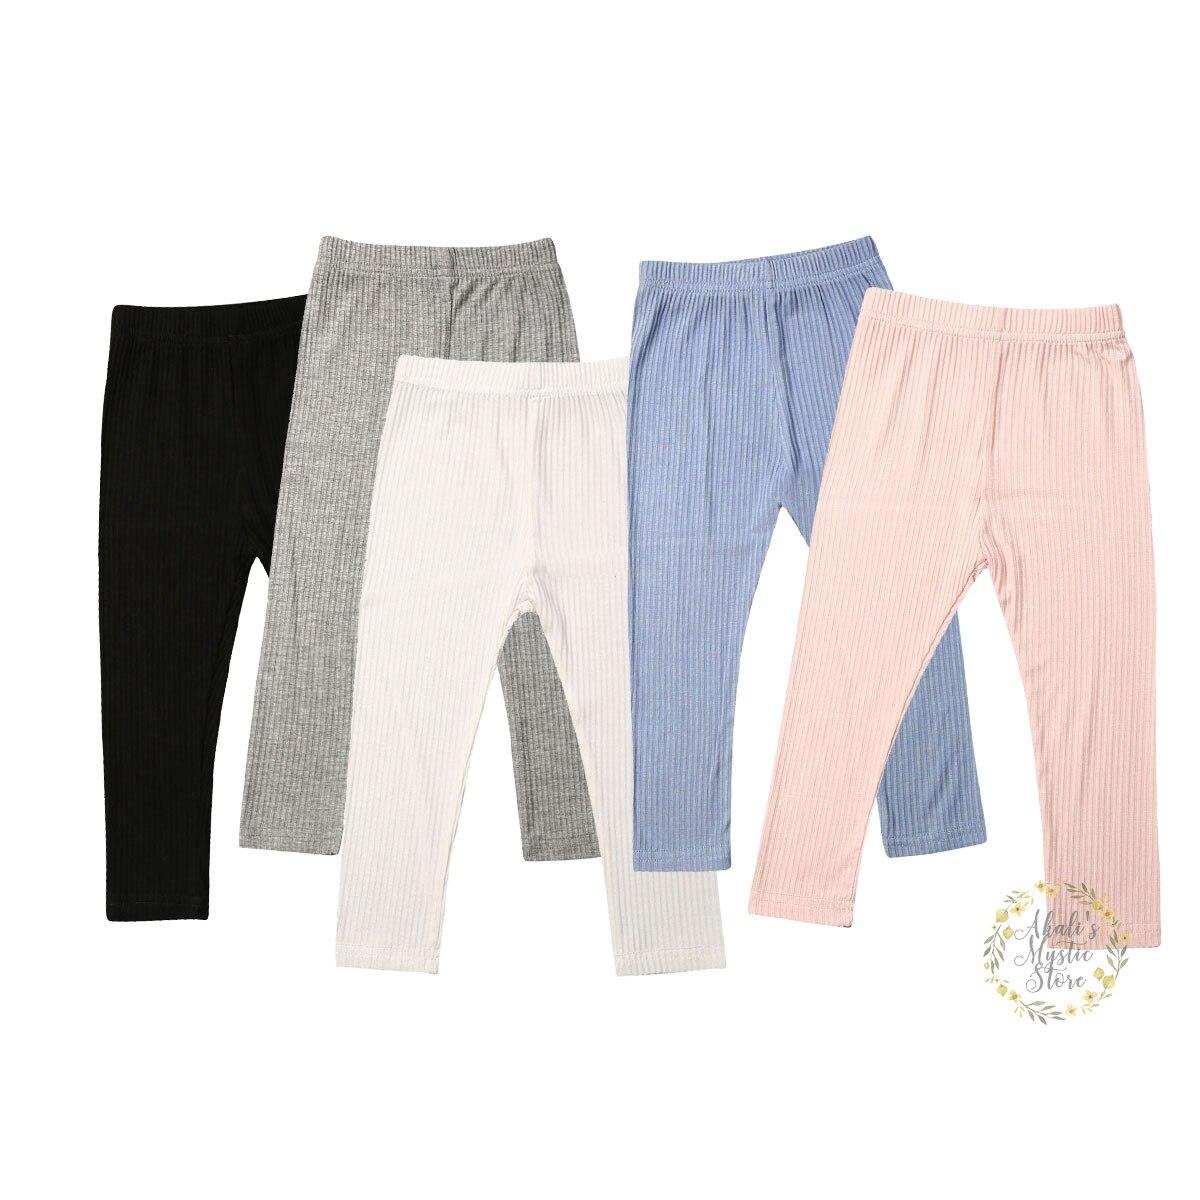 6M-4Y Toddler Newborn Baby Kid Girls Skinny Pants Solid Cotton Autumn Spring Leggings PP Trouser Bottoms